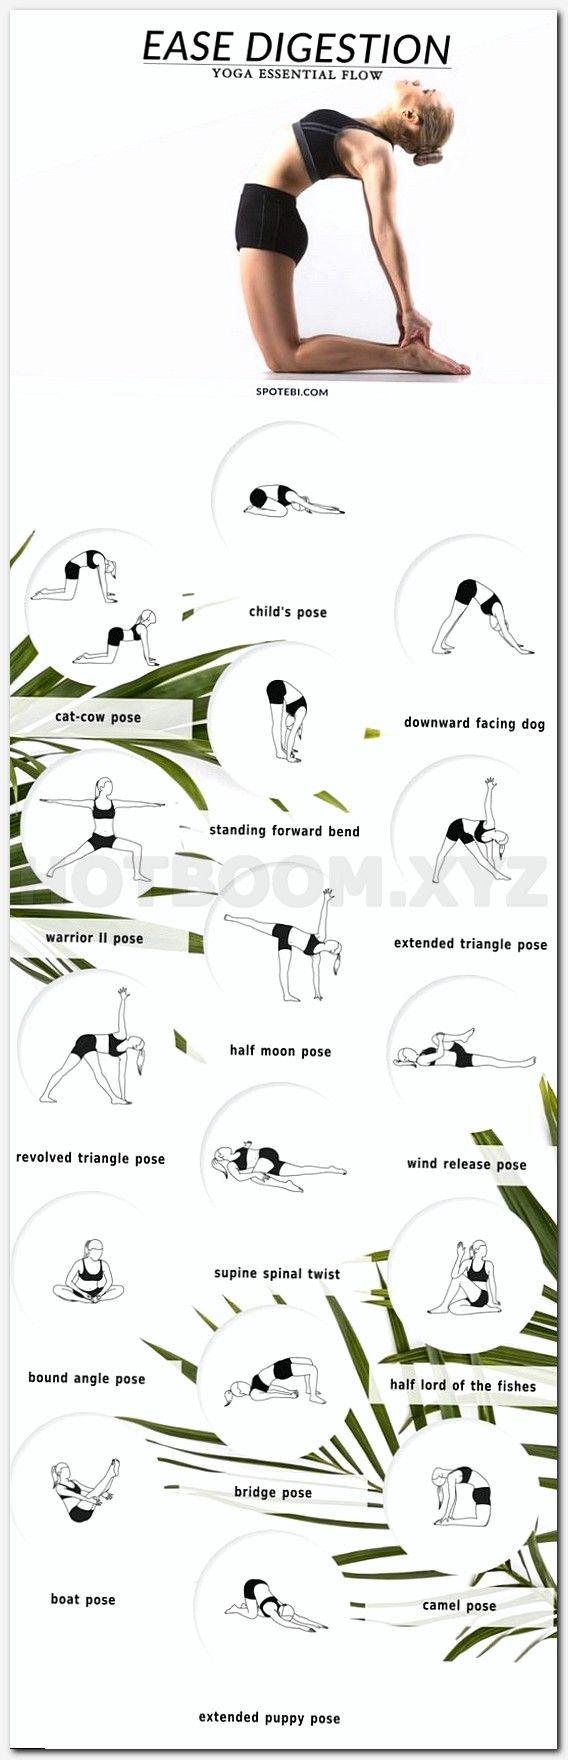 Lauki ka juice weight loss image 10